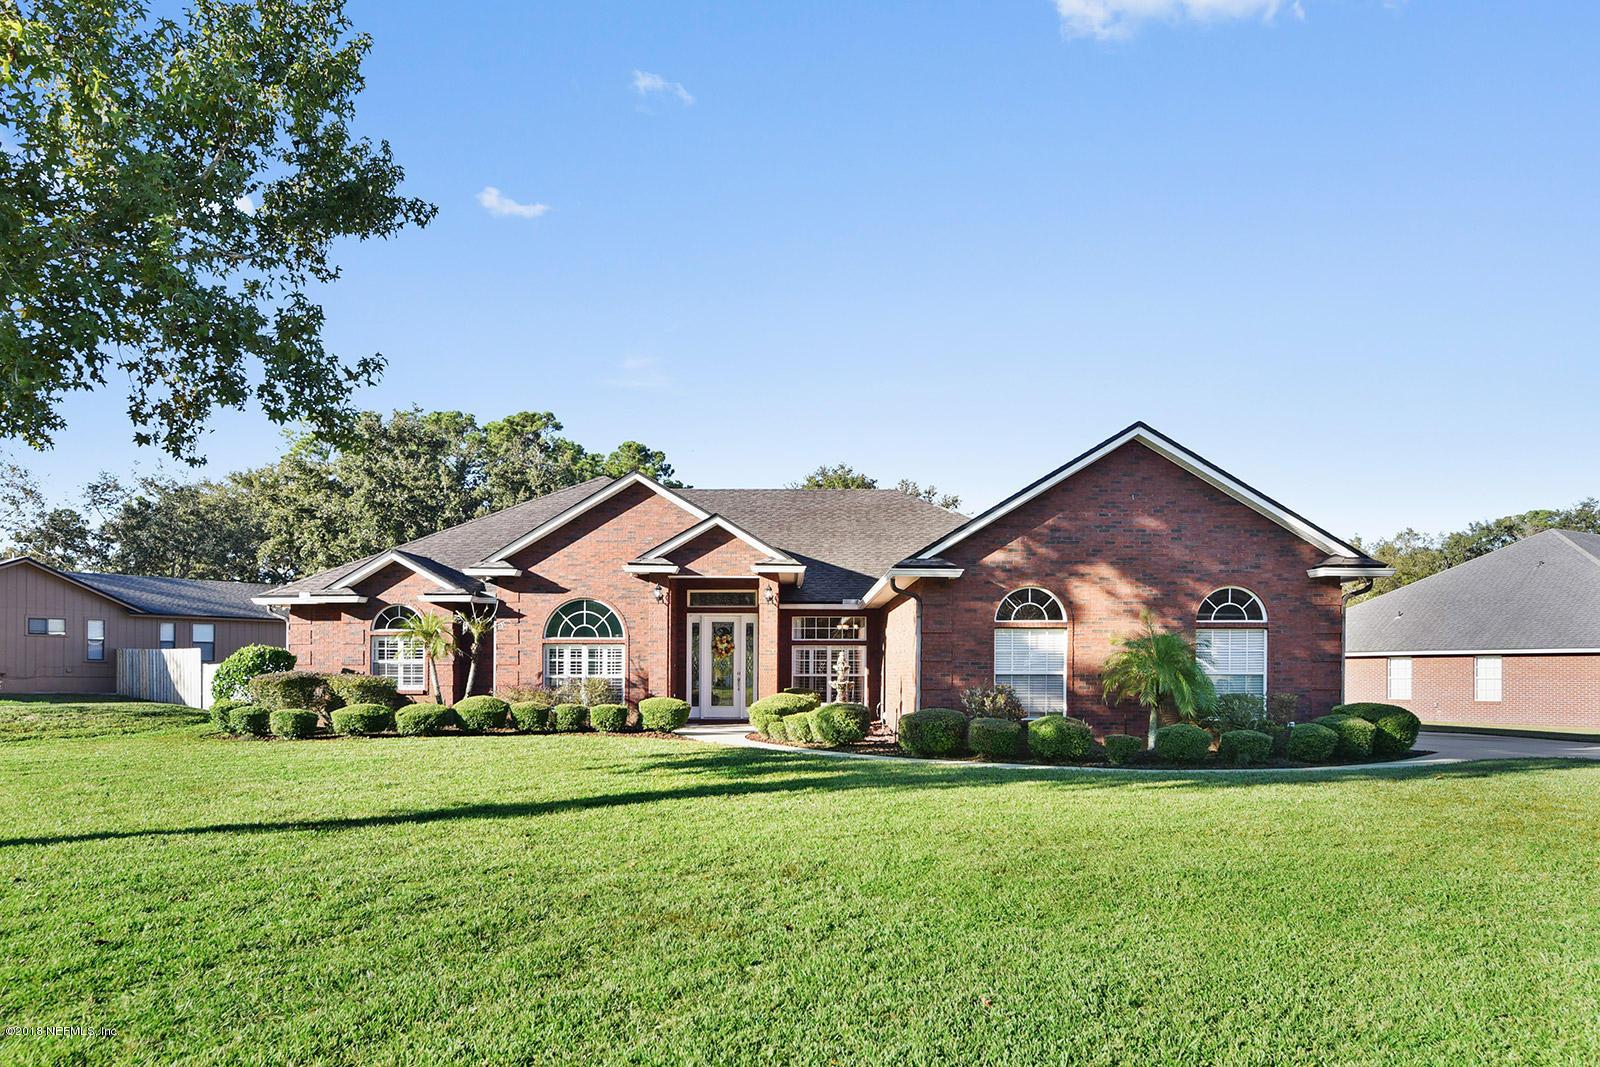 15177 LANDMARK, JACKSONVILLE, FLORIDA 32226, 4 Bedrooms Bedrooms, ,3 BathroomsBathrooms,Residential - single family,For sale,LANDMARK,967833